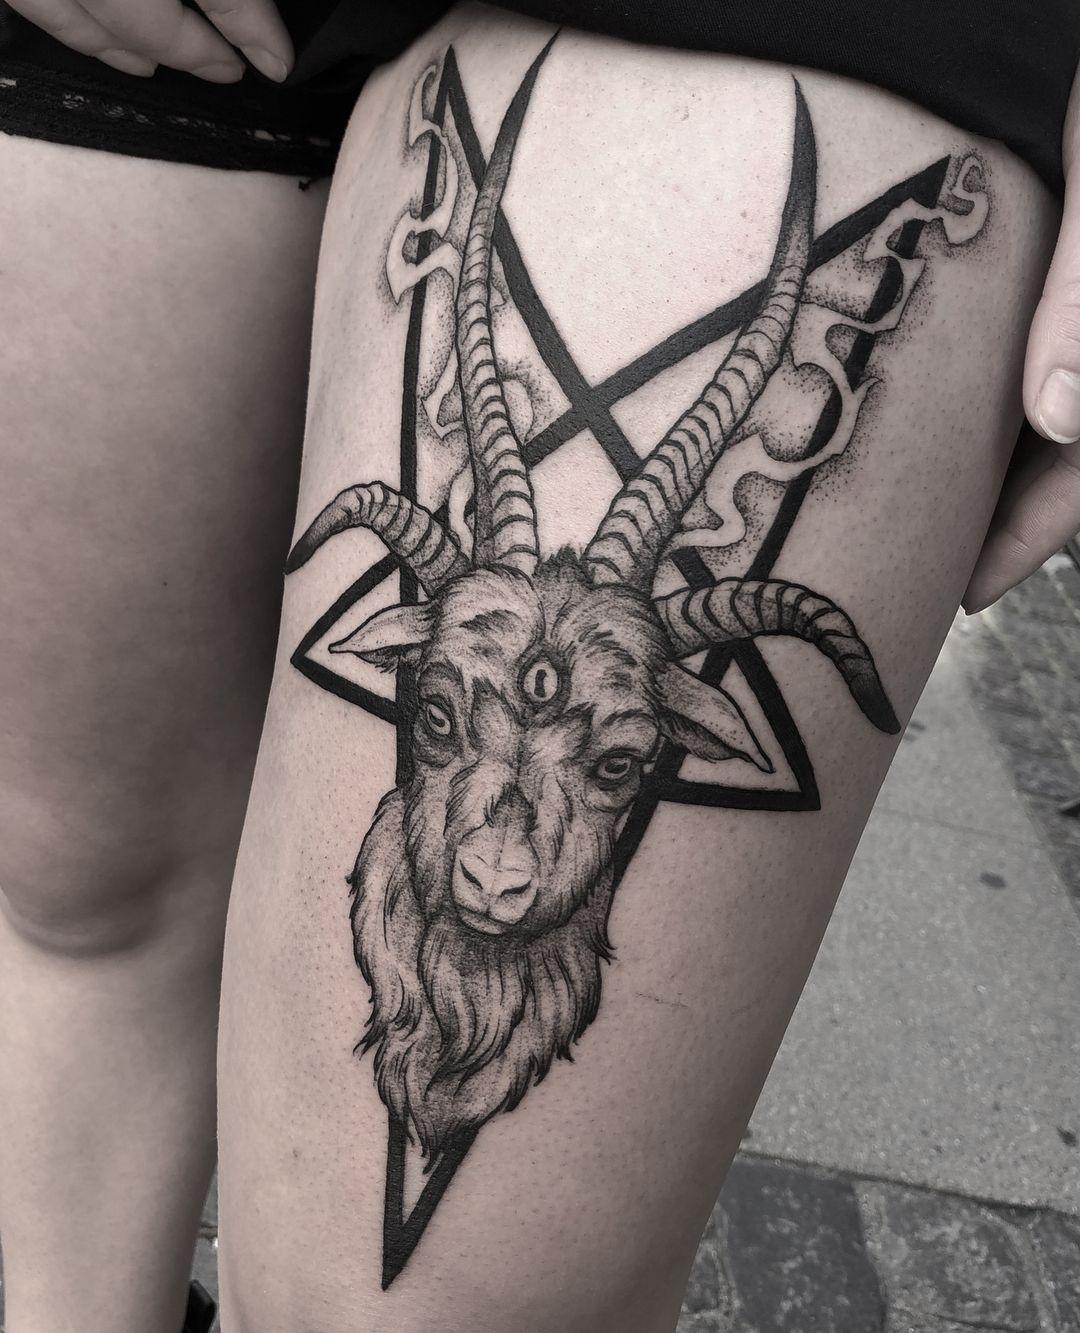 e9feb0b46 Cutesy little goat for Adriana 🔪 thank you and hail Satan! Made at  @deathorglorykbh . . . . . . . . #tattooapprentice #goat #satanic #satan…